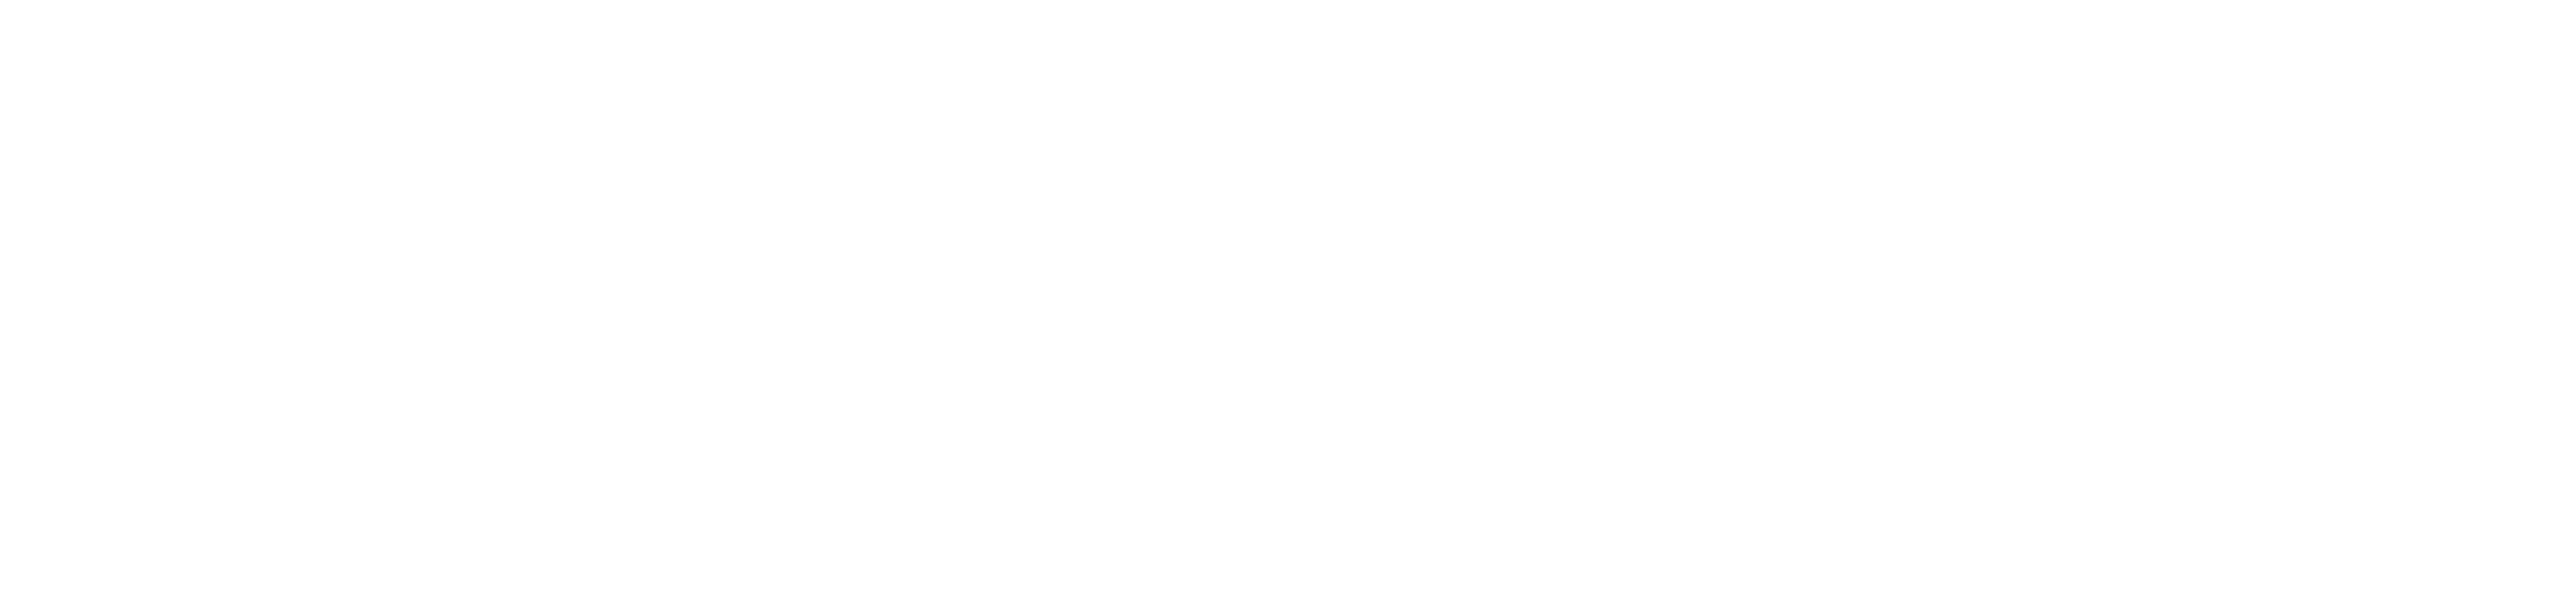 Lemontech logo